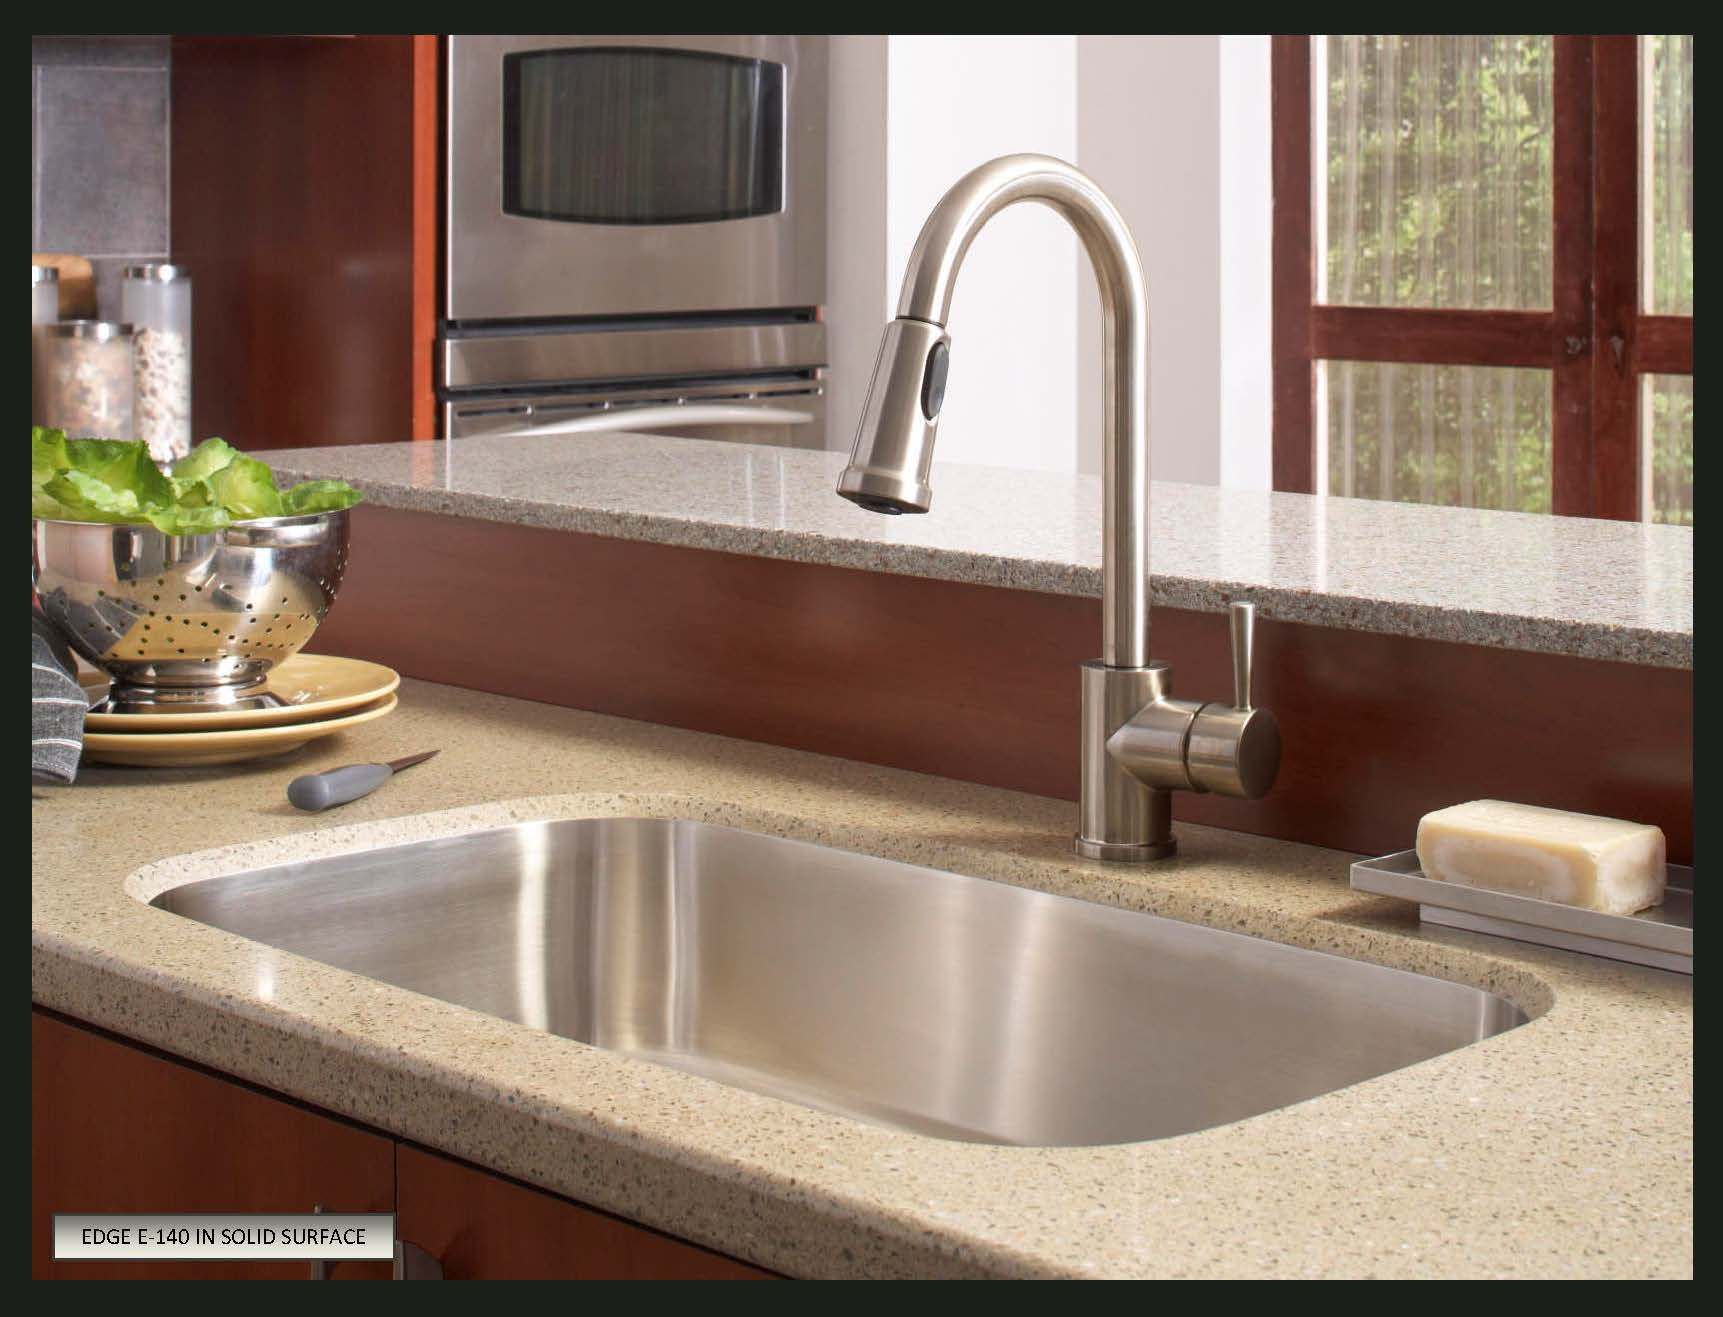 choose sink solid surface countertops stainless steel kitchen sinks Karran Undermount Stainless Steel Sinks